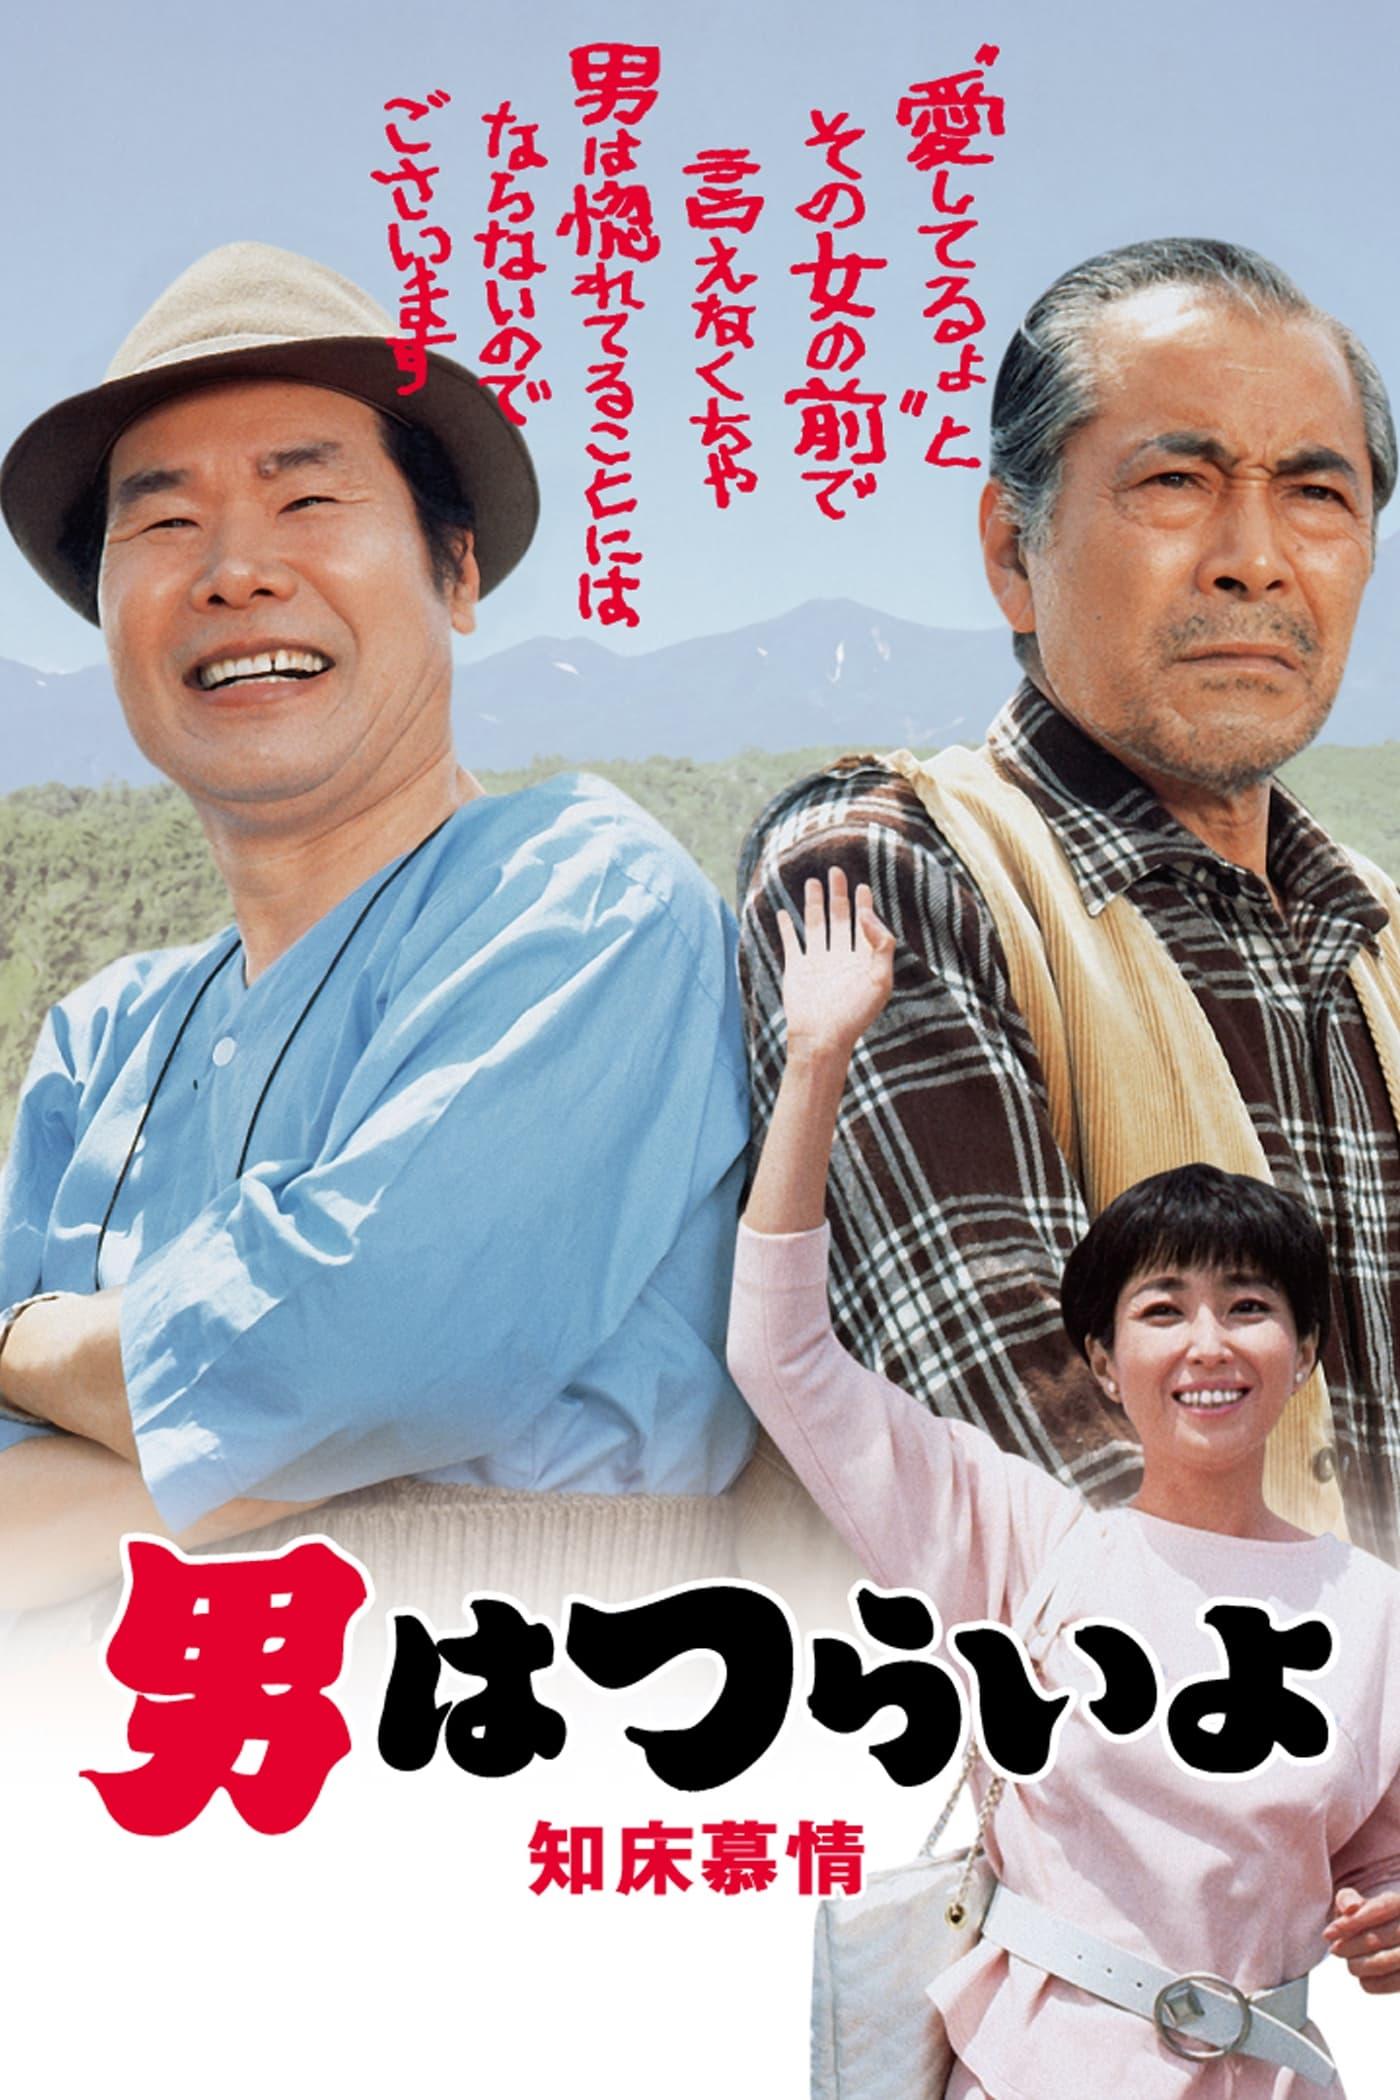 Tora-san: Longing for Mt. Shiretoko